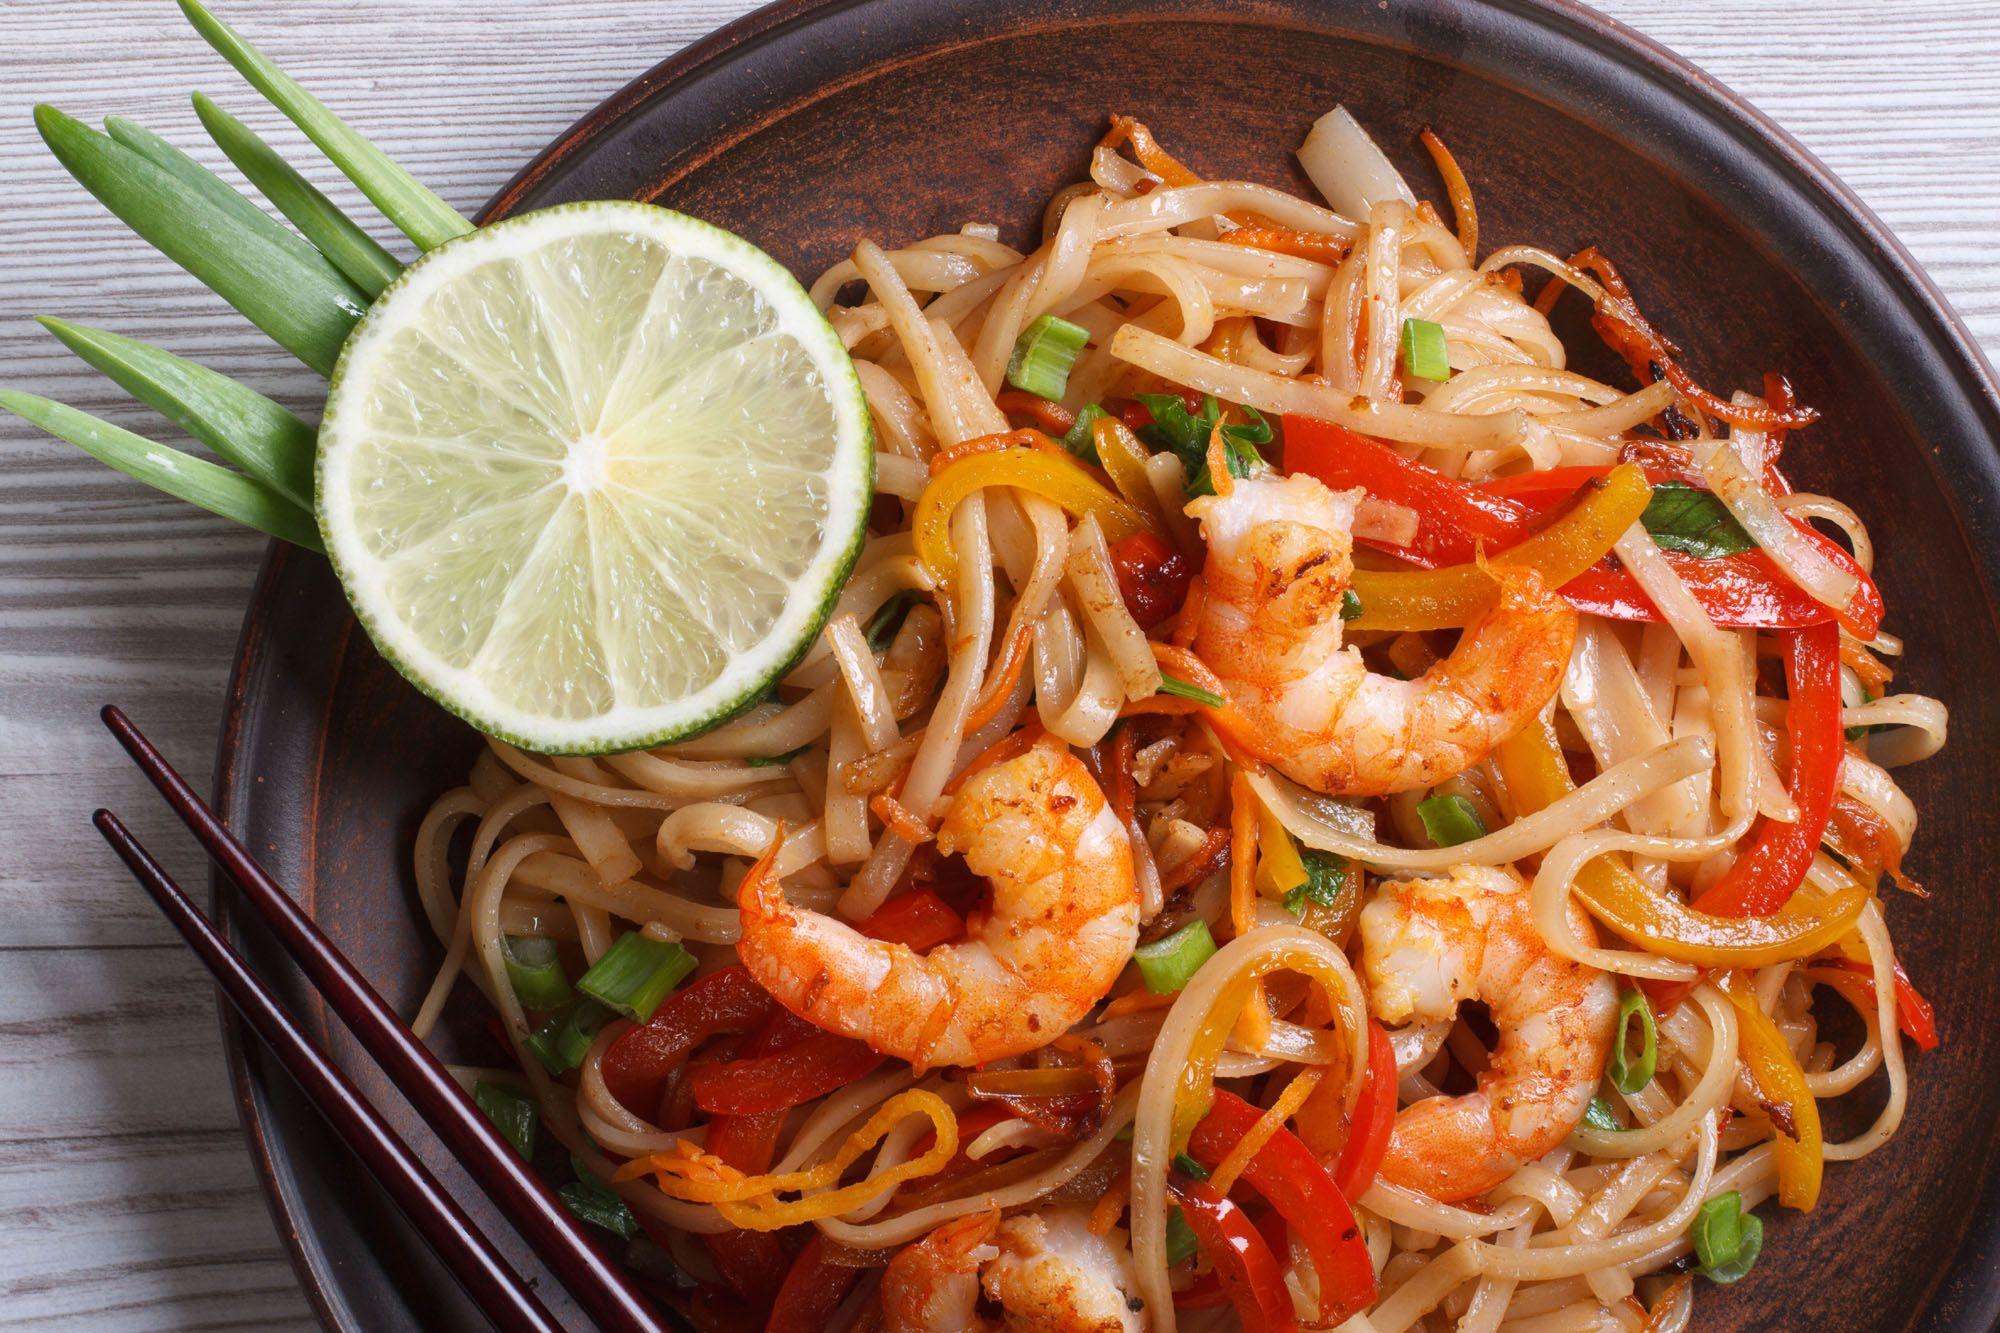 Cuisine thai food seafood appetizers cuisine thai tuk tuk